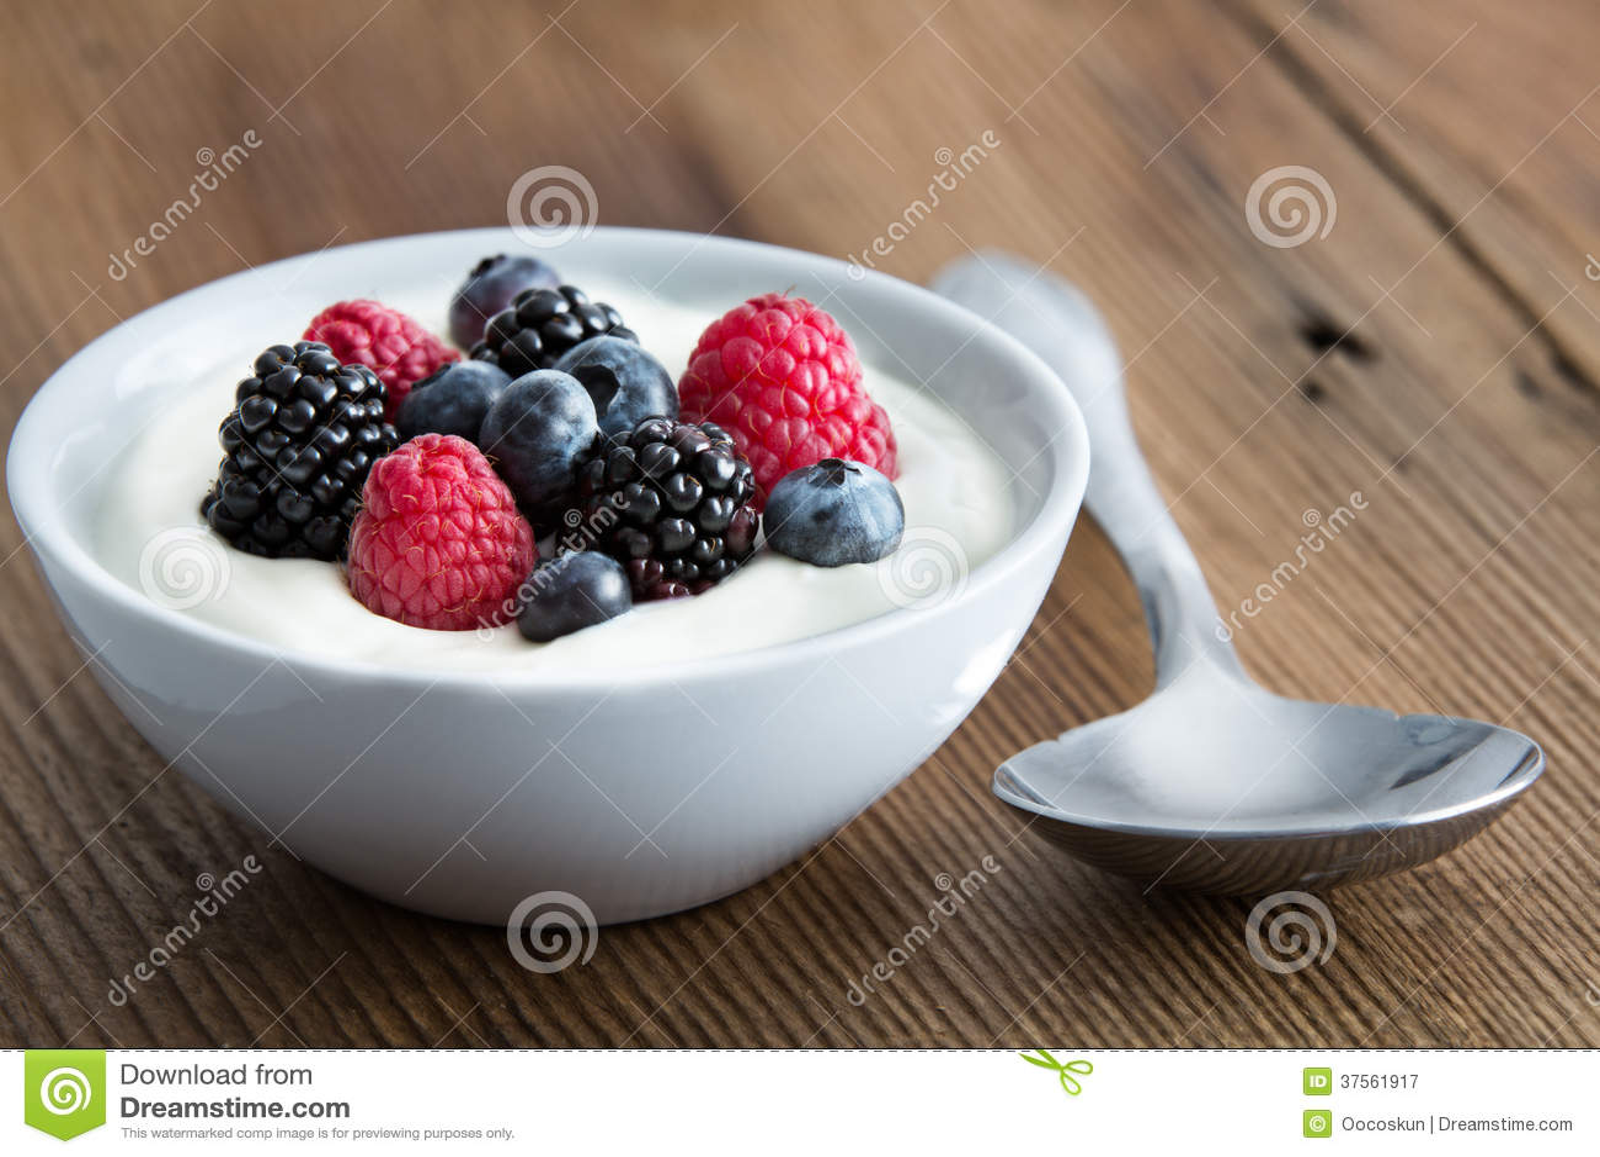 Download Bowl Of Fresh Mixed Berries And Yogurt Stock Image - Image of antioxidant, cuisine: 37561917